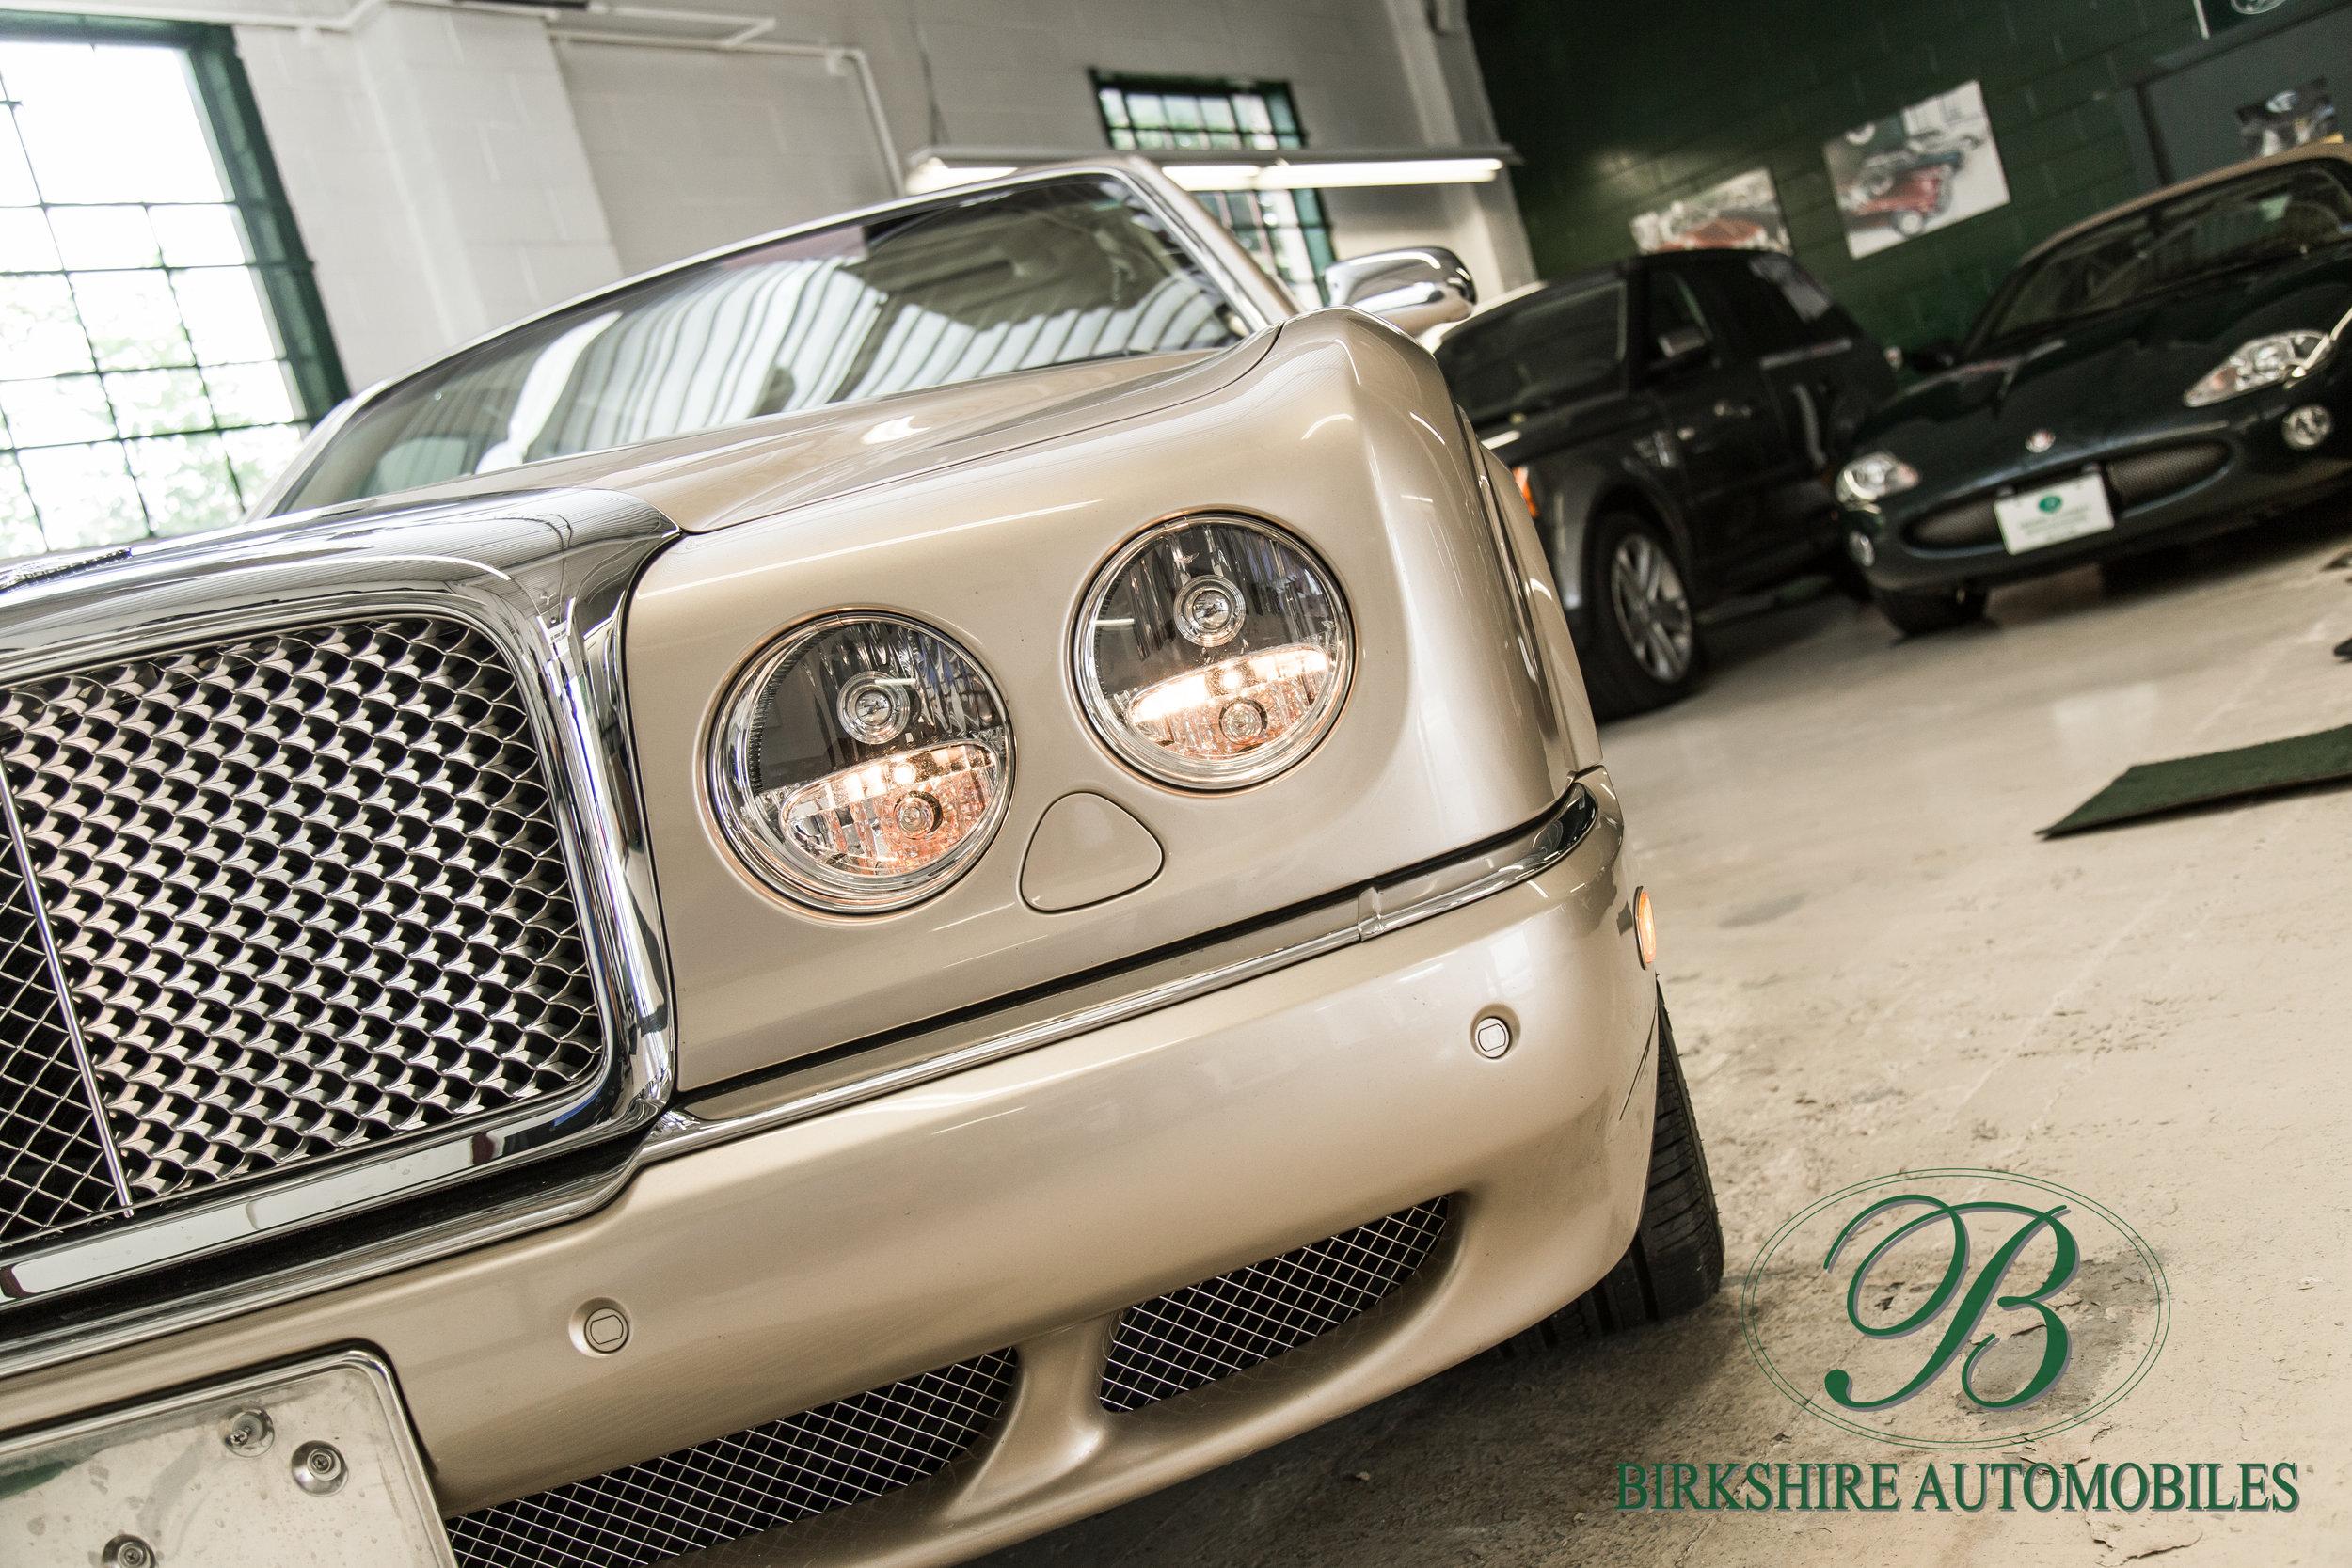 Birkshire Automobiles-322.jpg